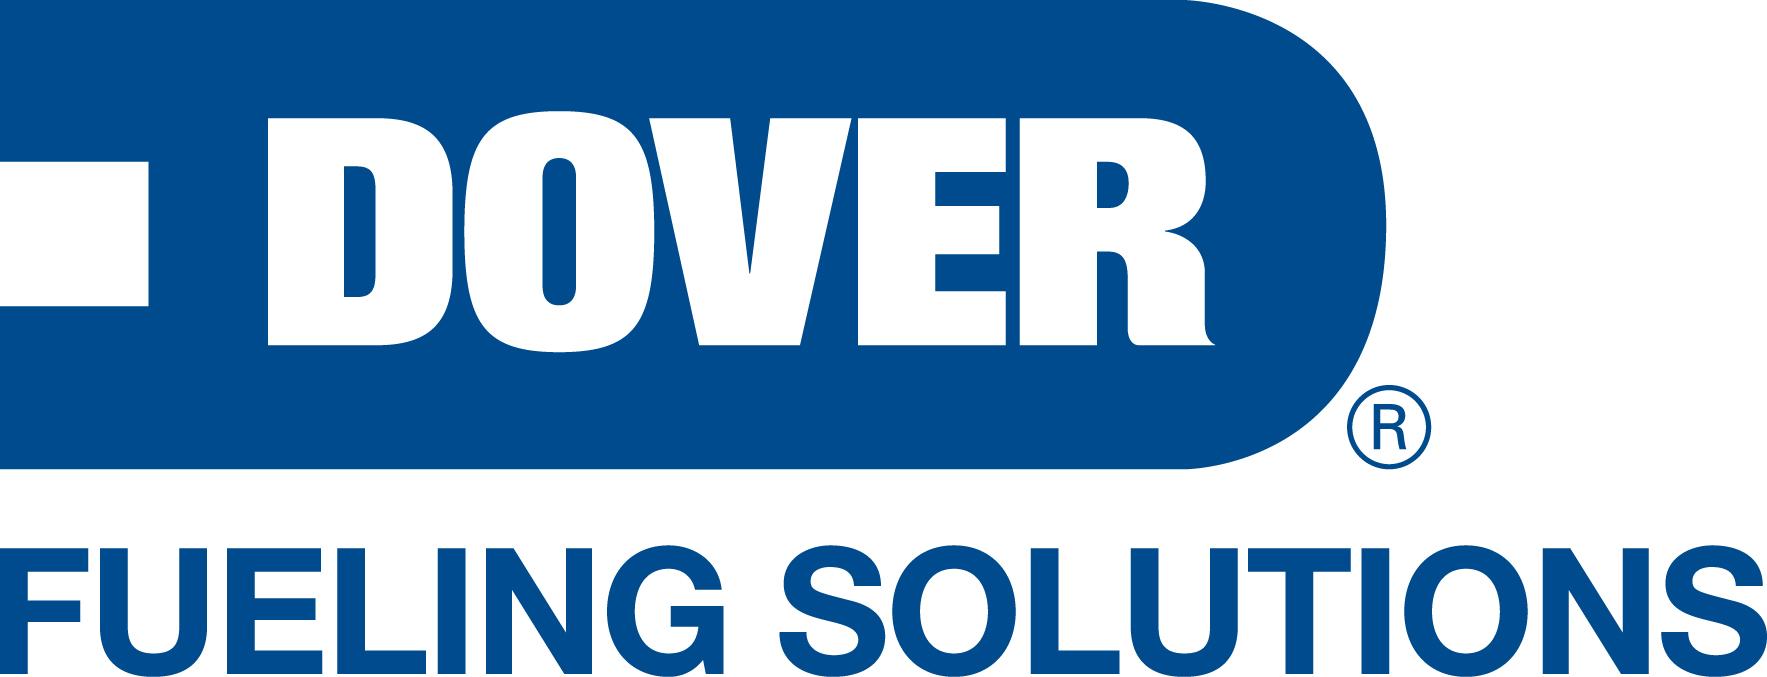 Dover-Fueling-Solutions-Logo-Blue.jpg